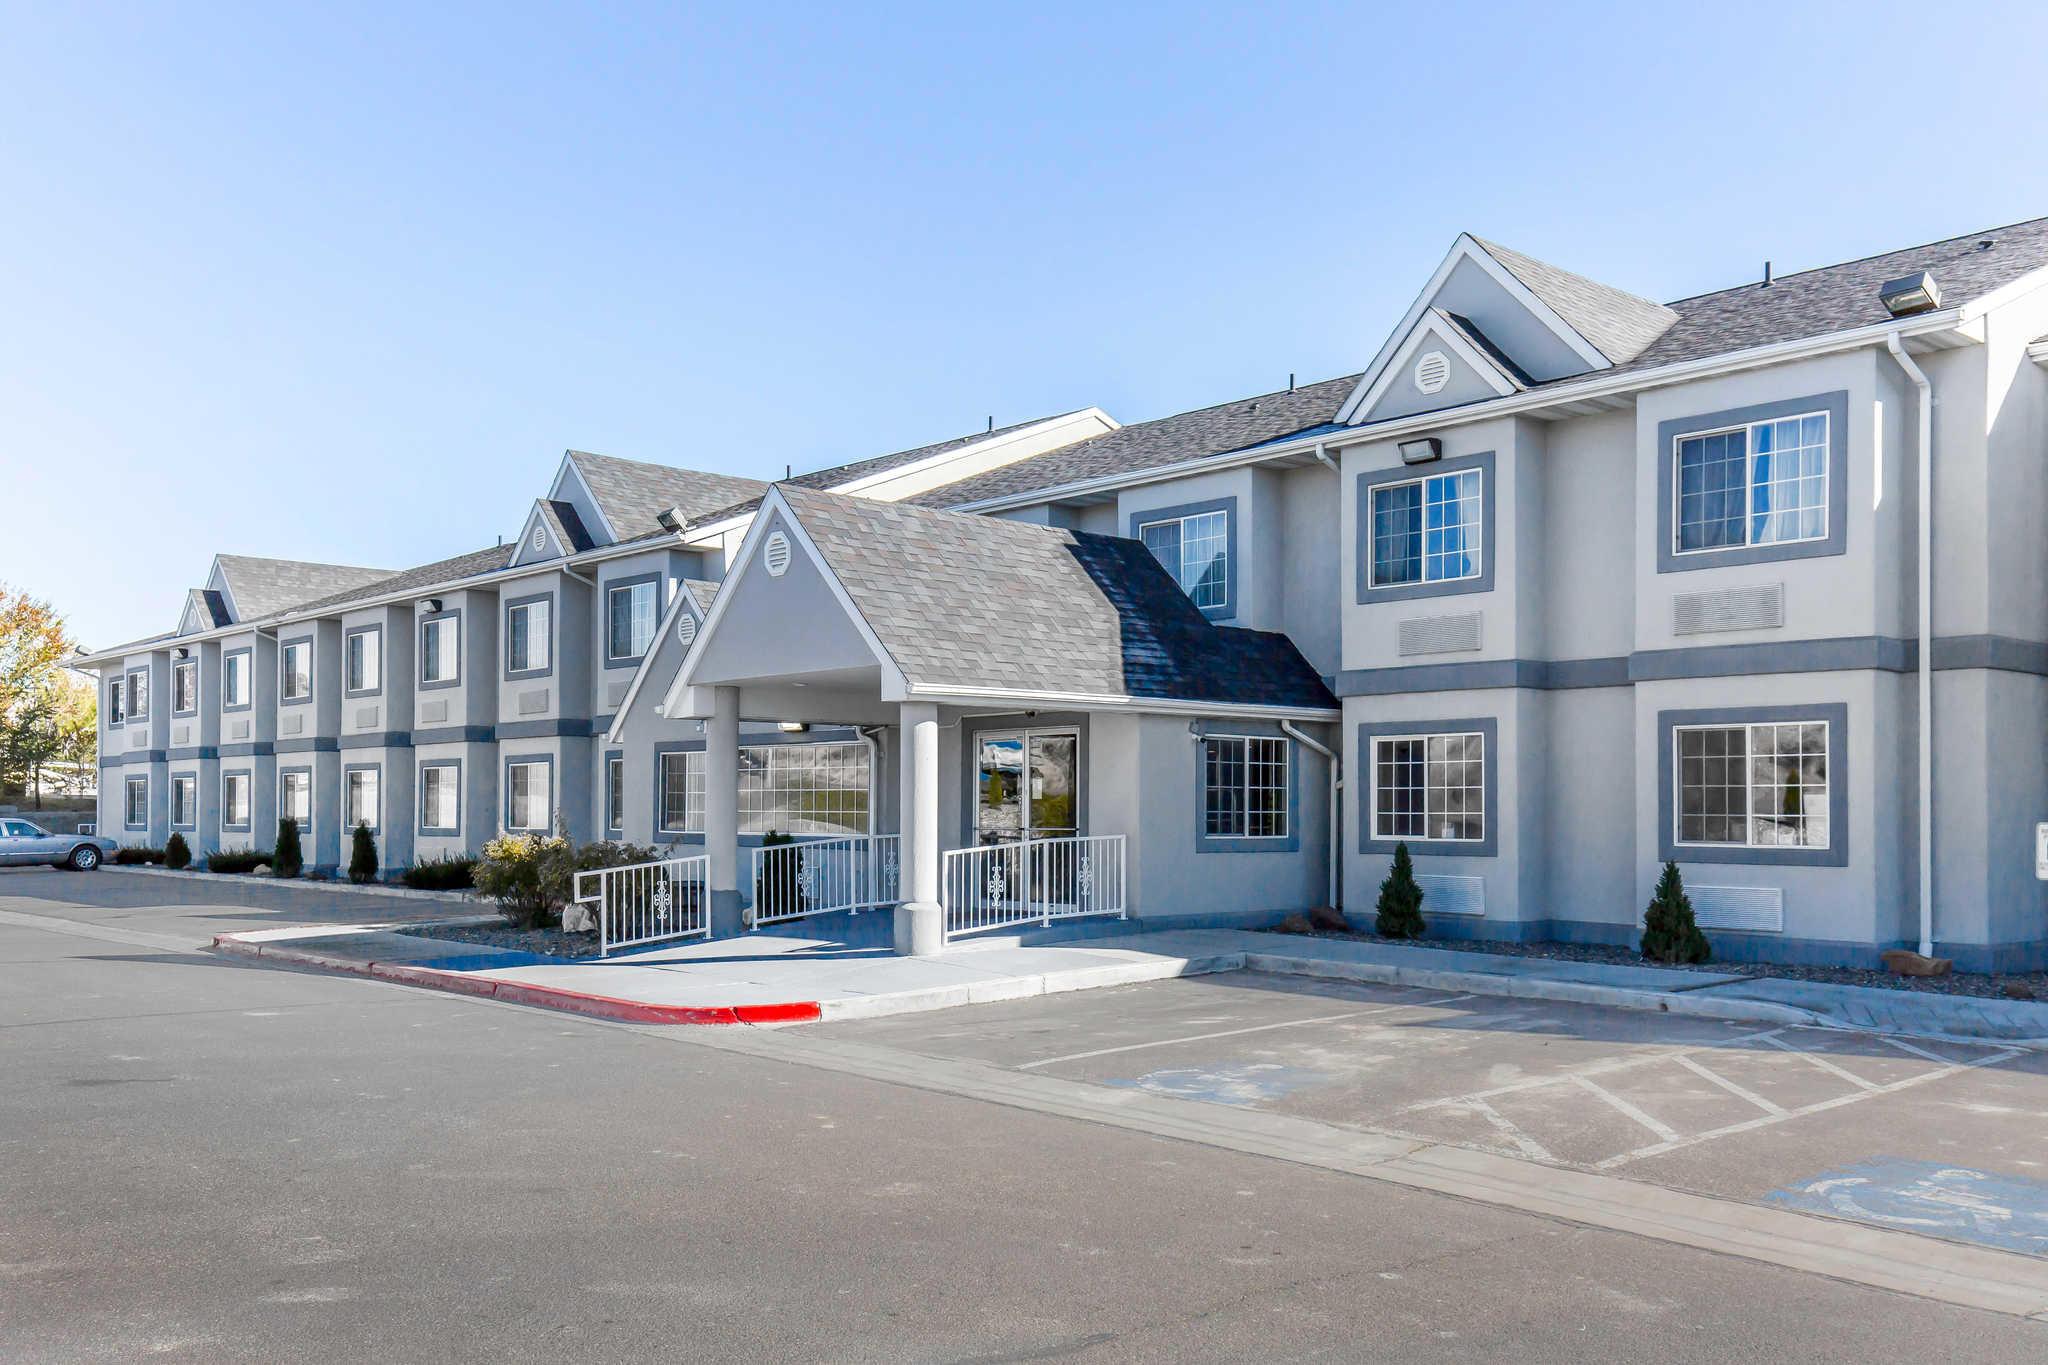 Quality Inn & Suites Elko image 1